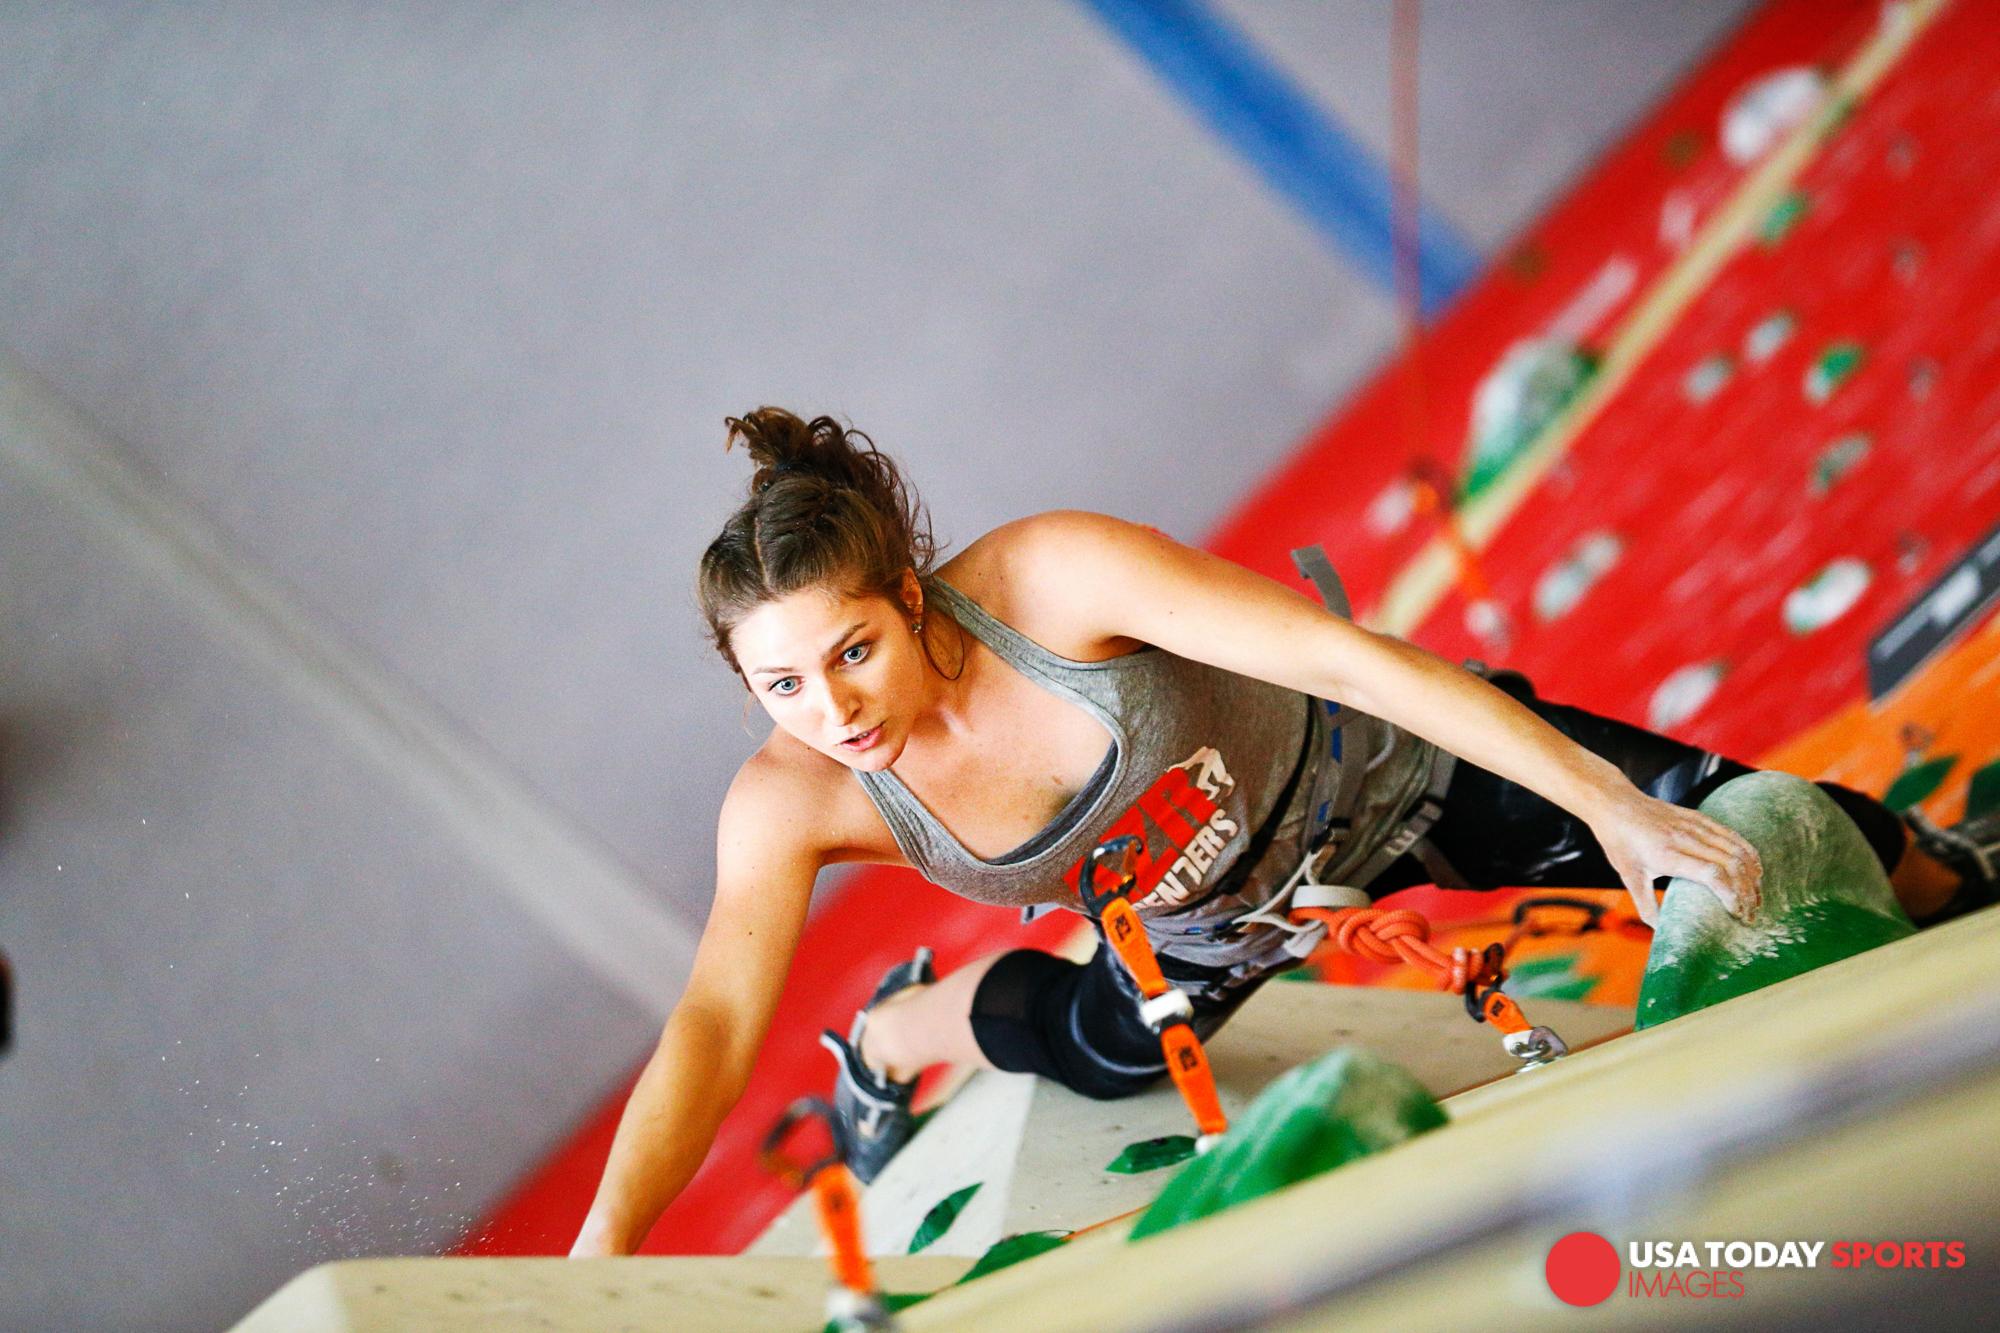 Garrett_Reid_atlanta_advertising_commercial_photographer_sport_and_speed_youth_national_chap_climbing-20.jpg